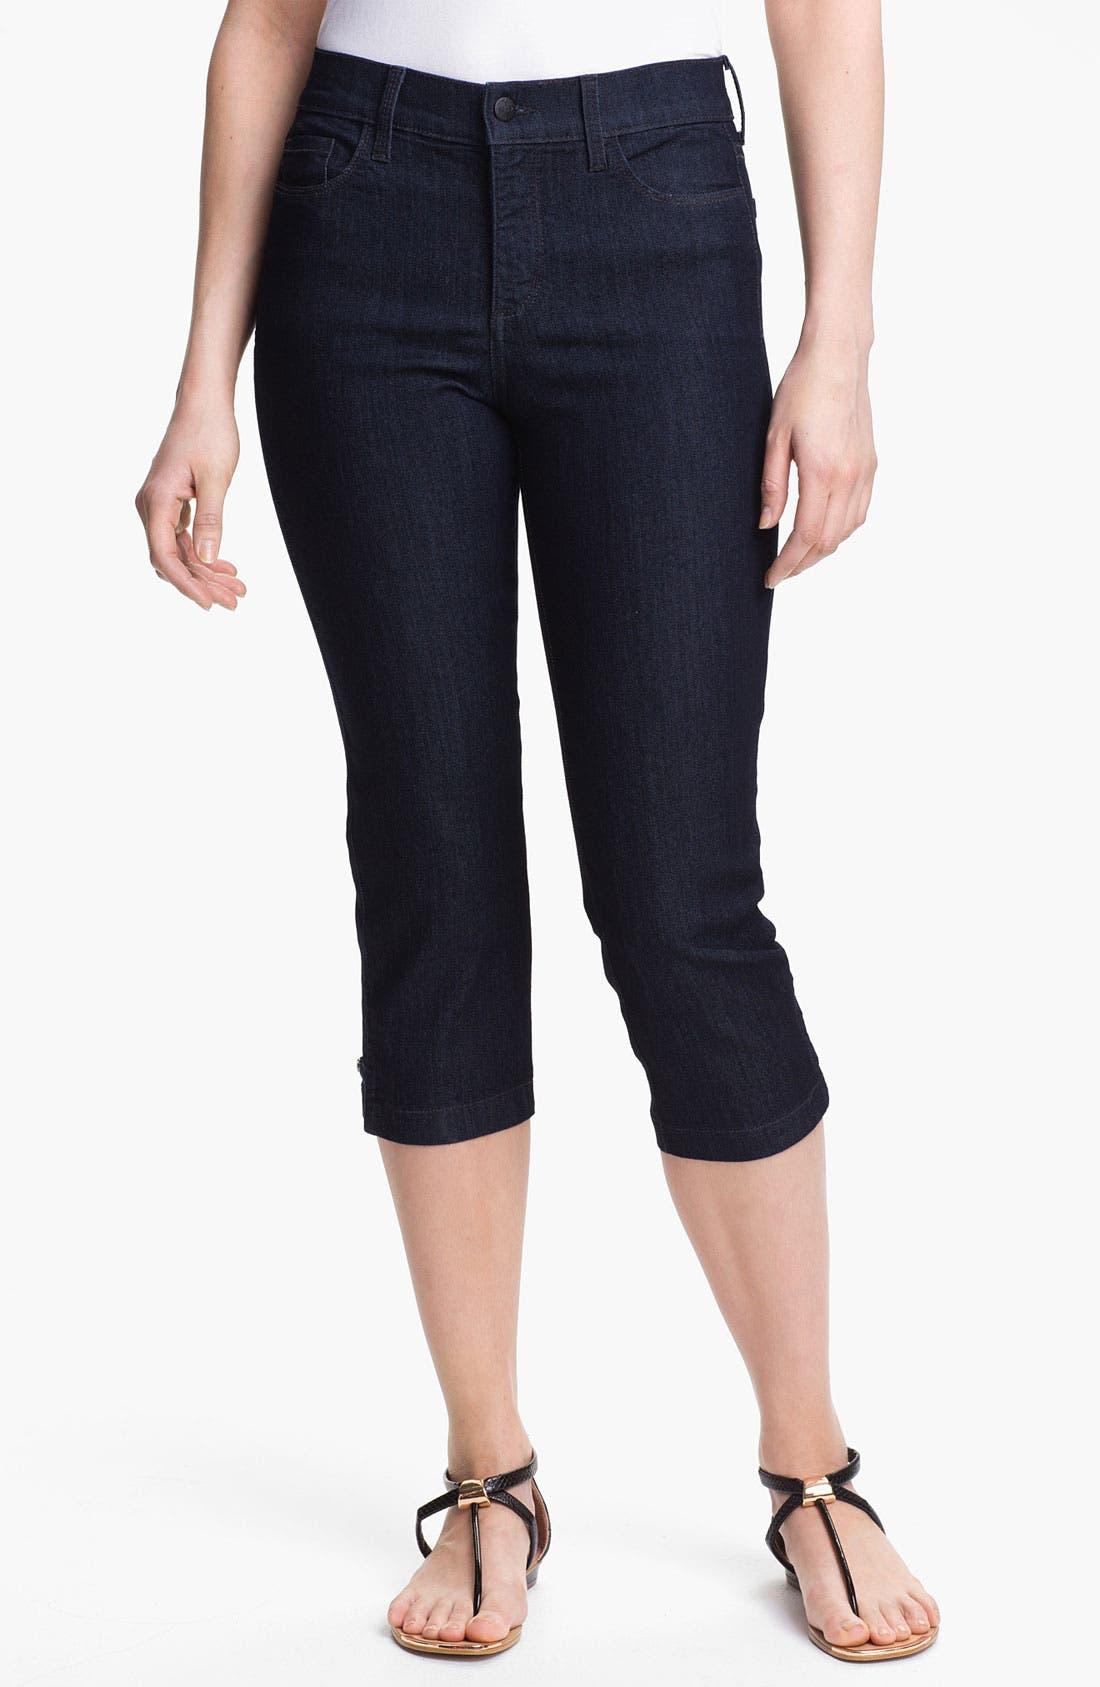 Main Image - NYDJ 'Winona' Crop Stretch Jeans